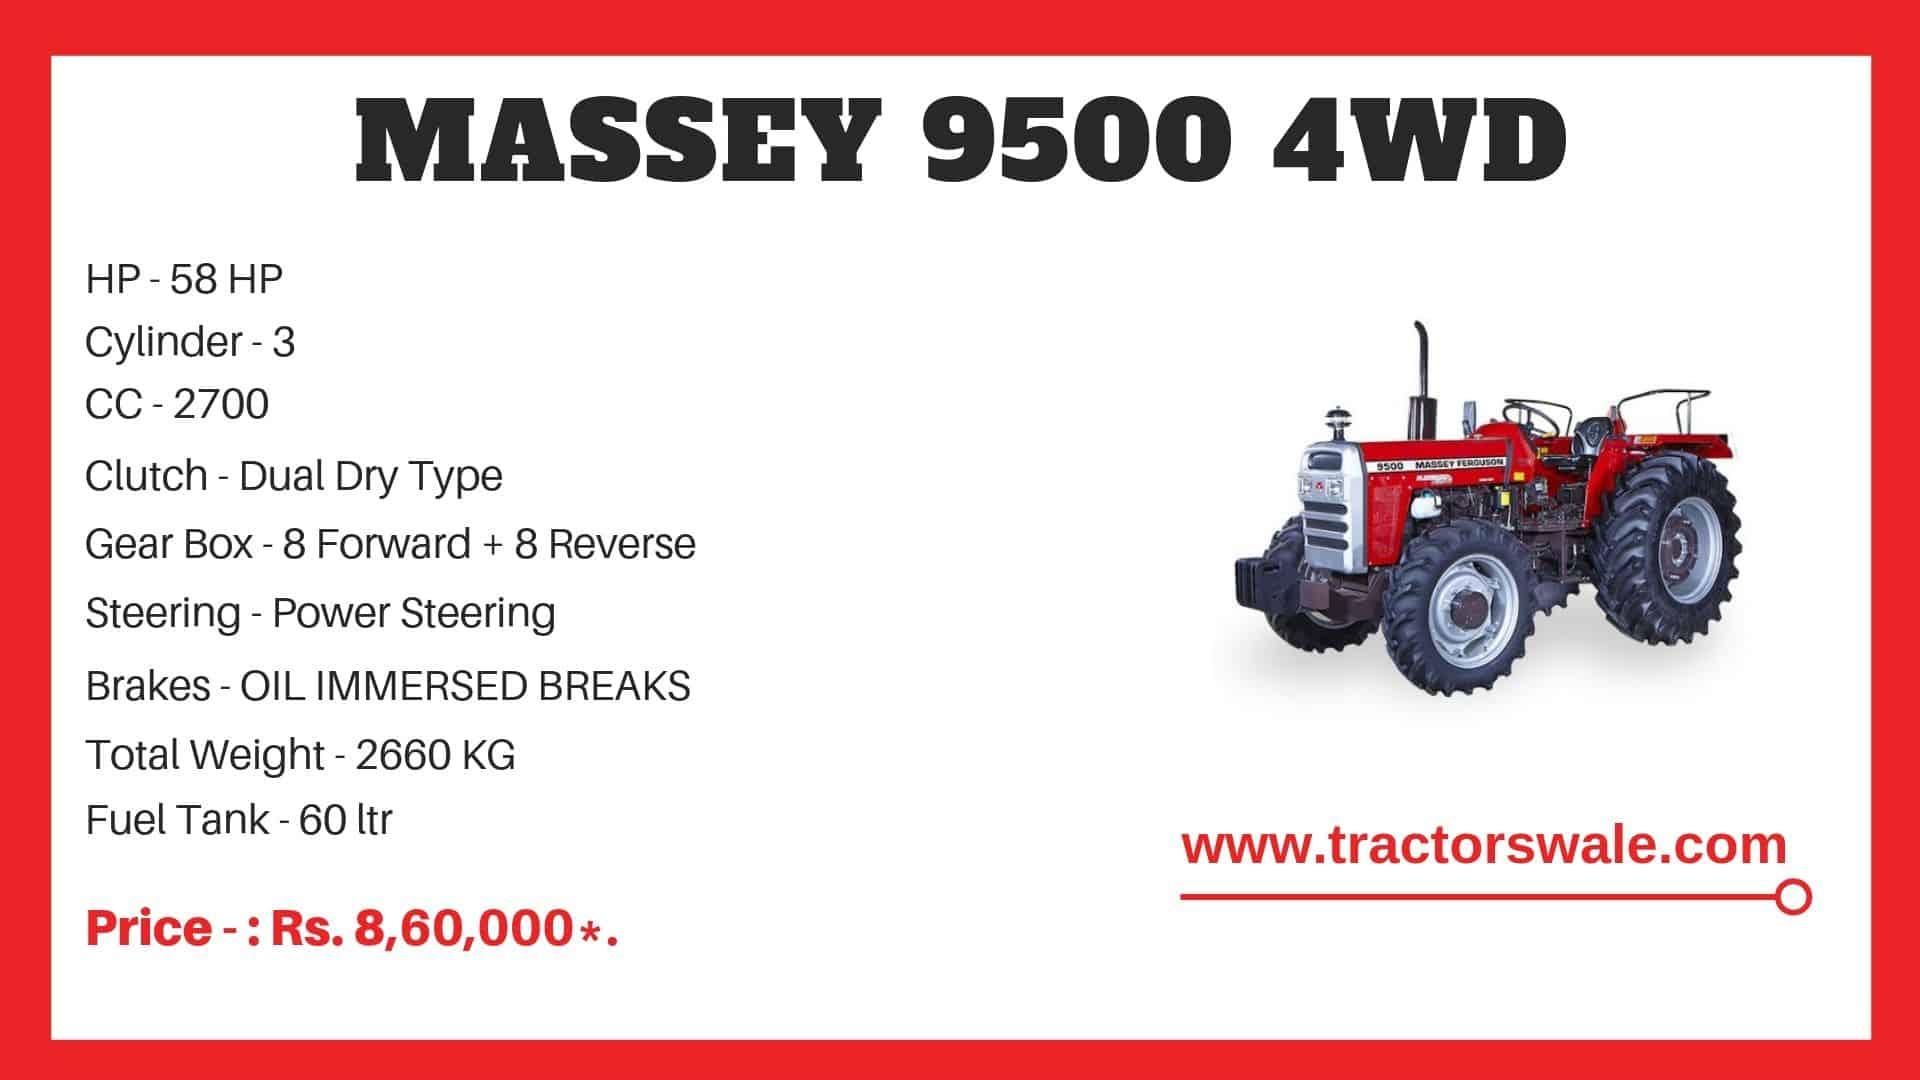 Specifications Of Massey Ferguson 9500 4WD